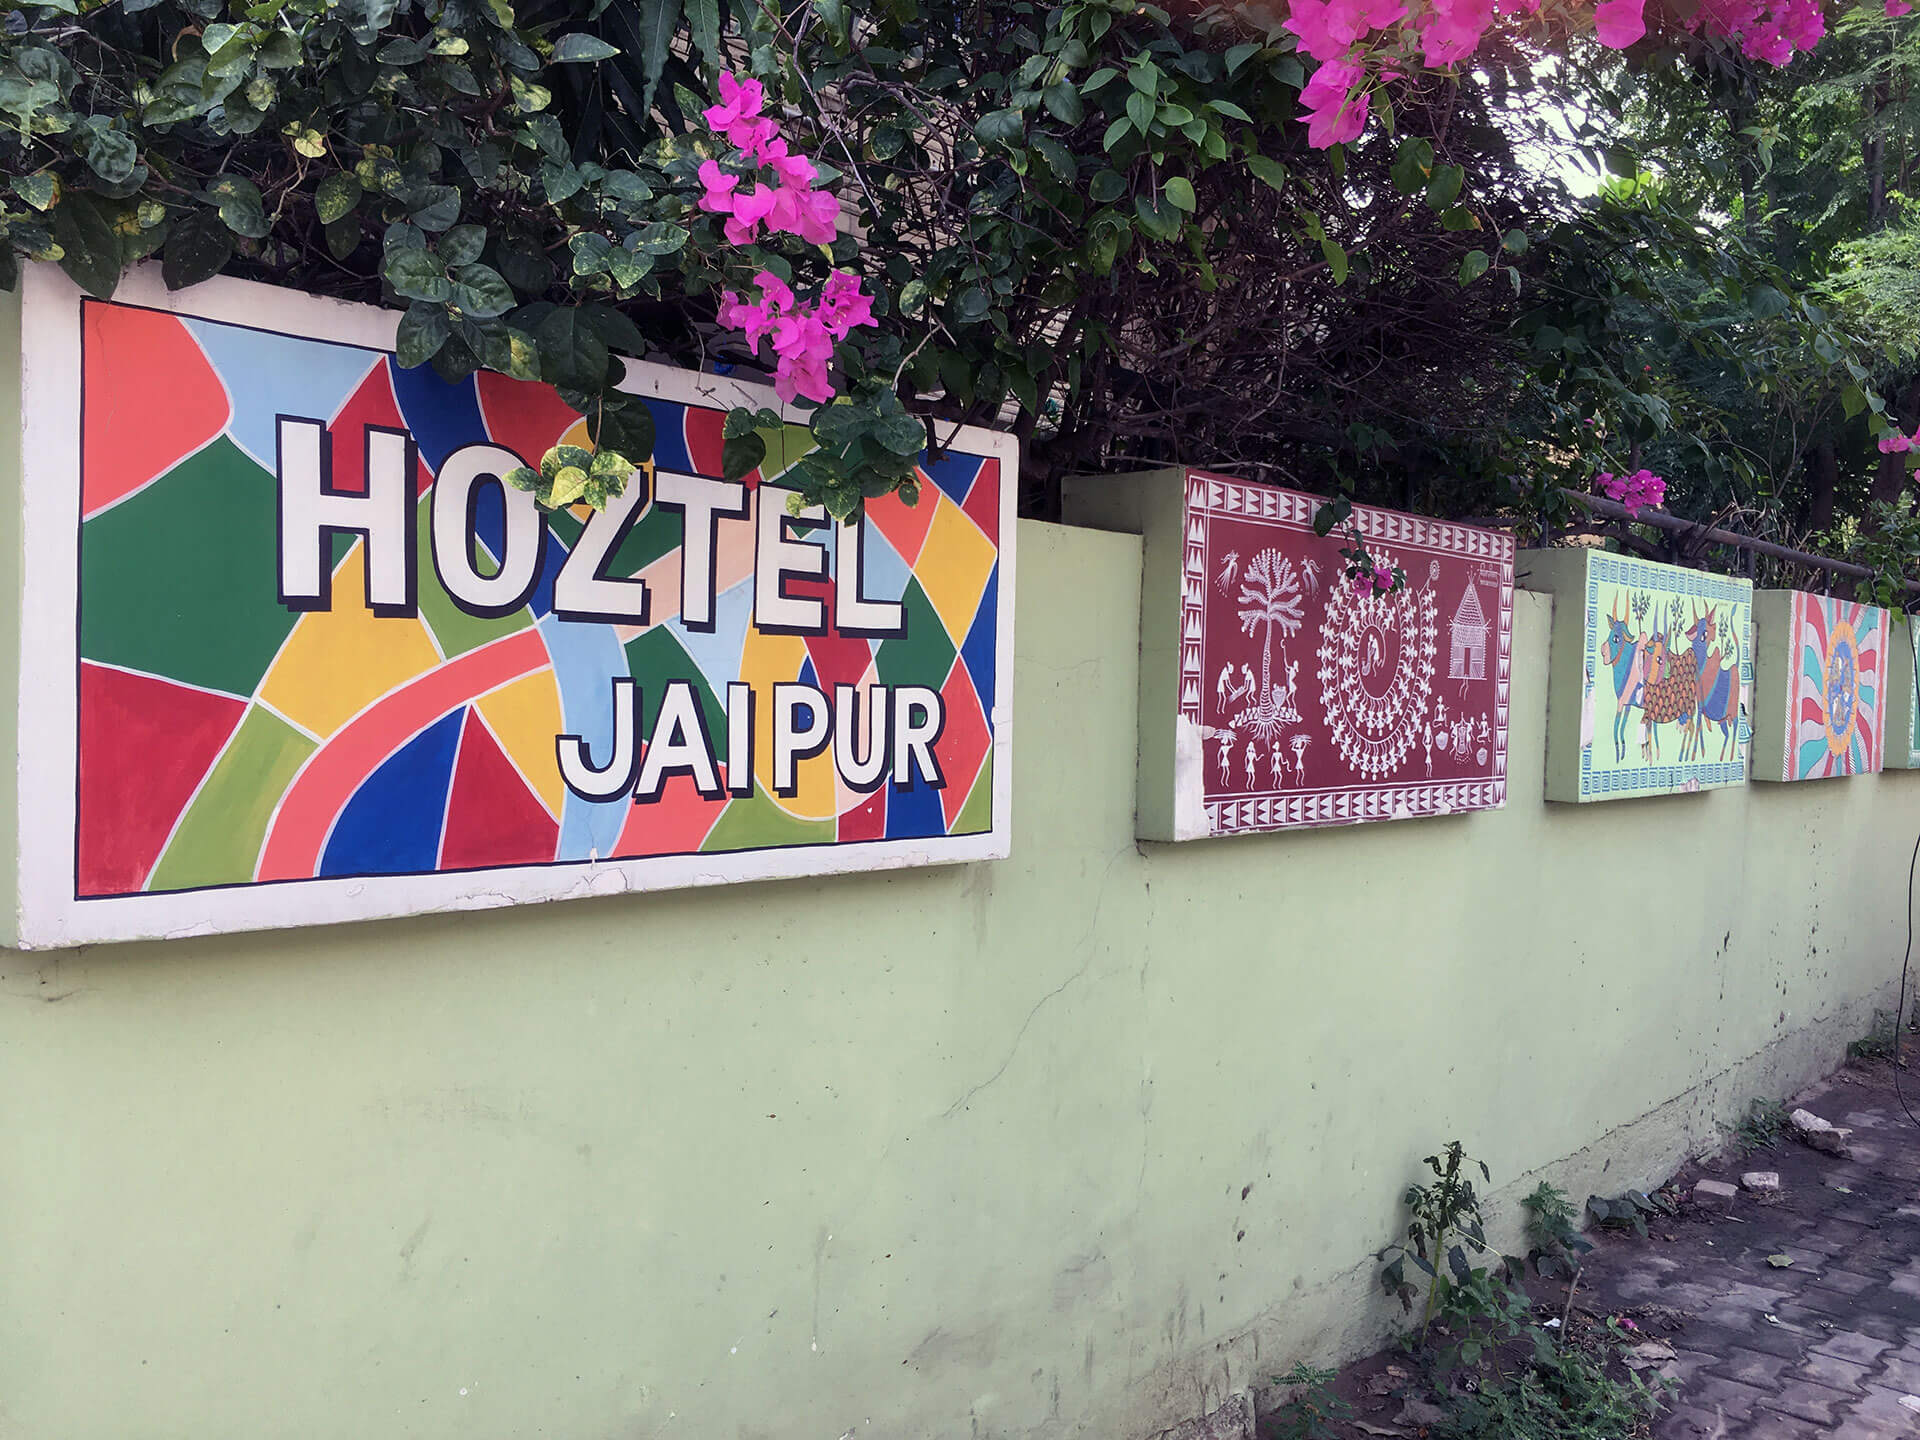 Hostel in Jaipur